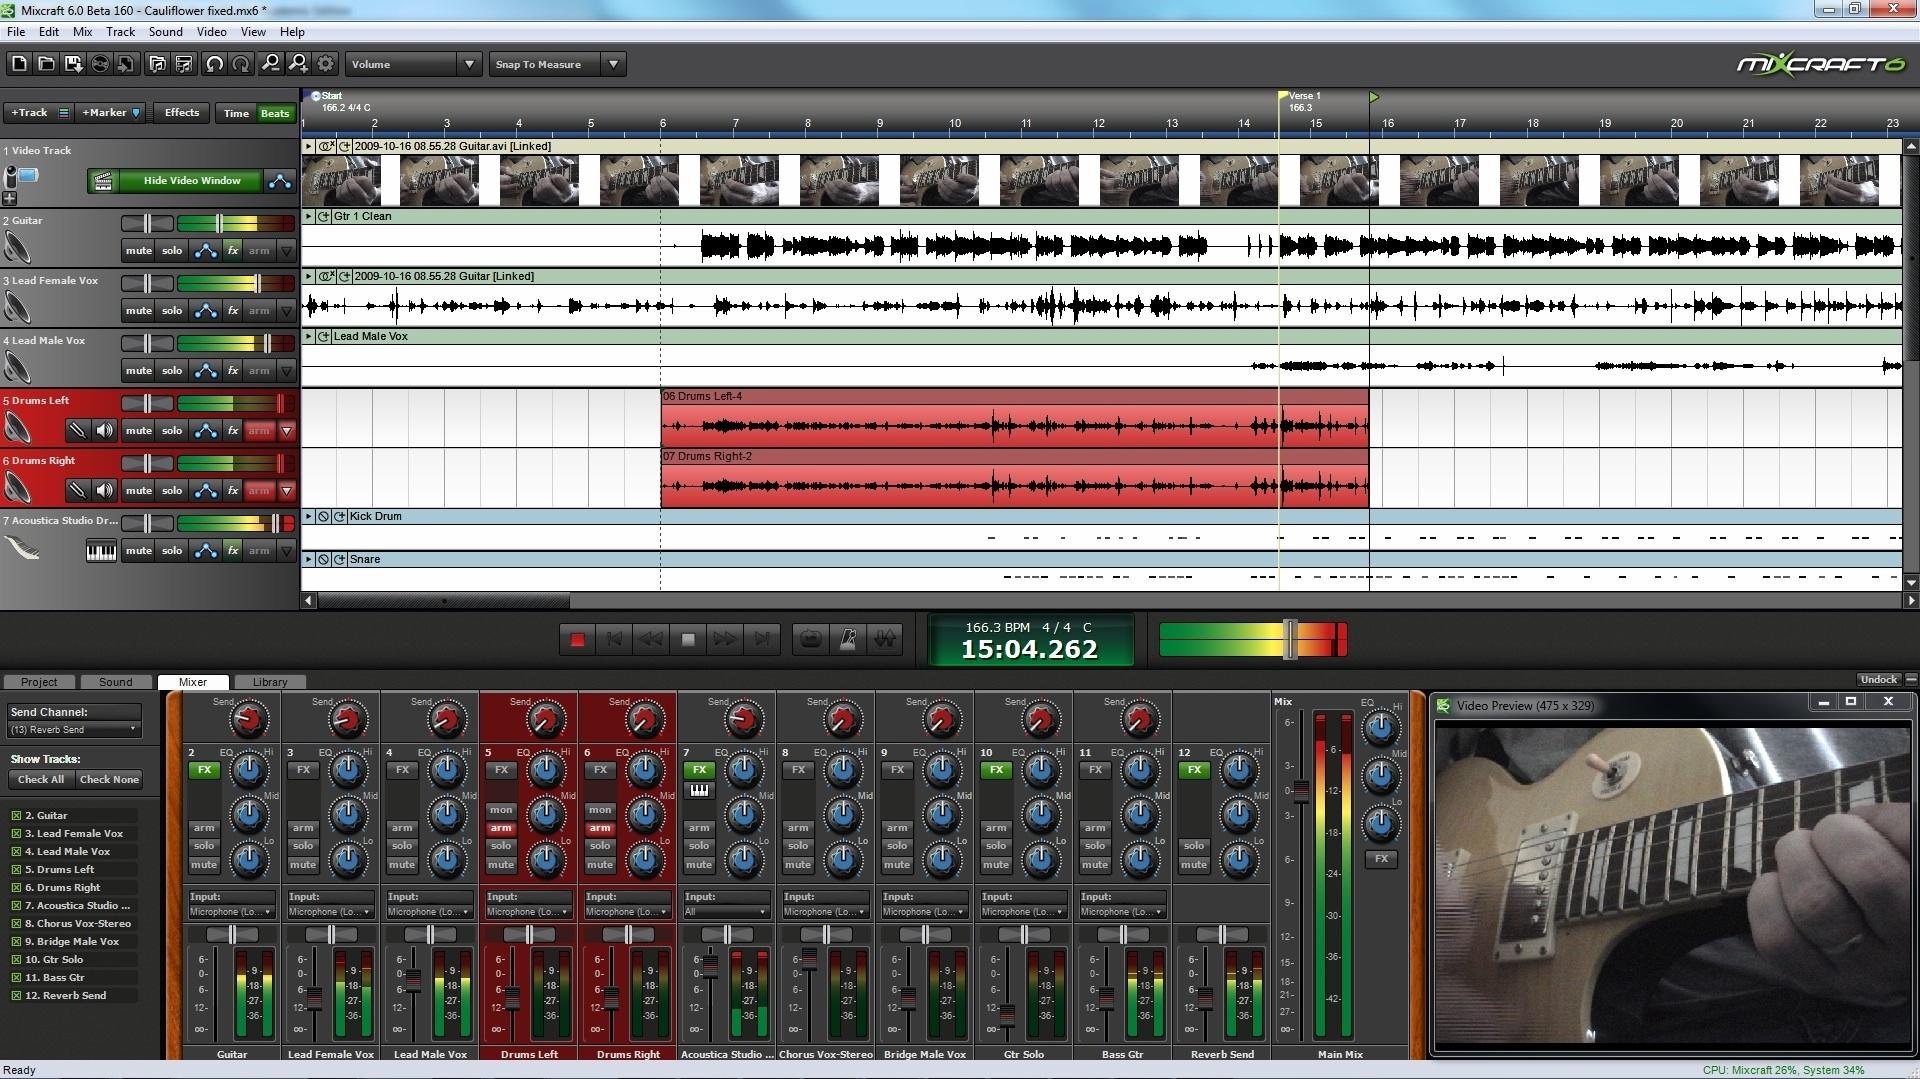 http://www.synthtopia.com/wp-content/uploads/2012/01/Mixcraft-6-Screenshot.jpg